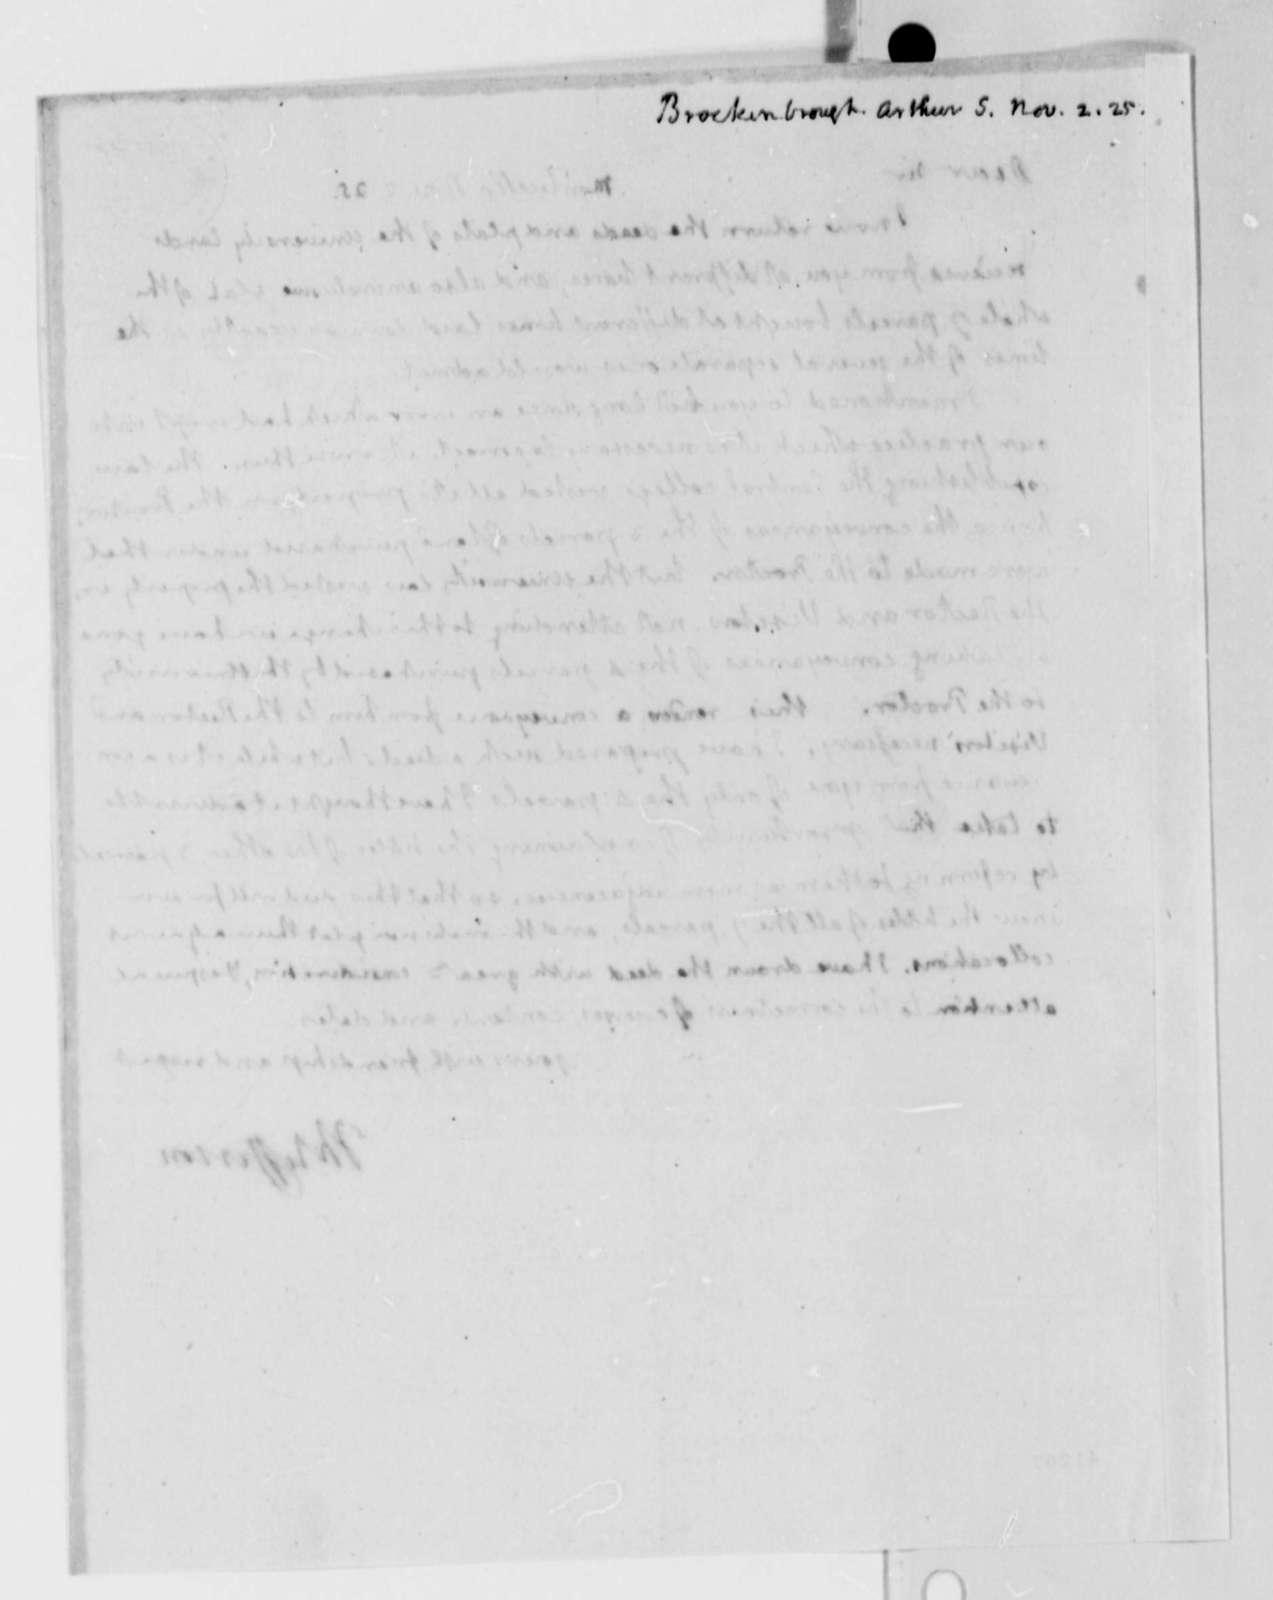 Thomas Jefferson to Arthur S. Brockenbrough, November 2, 1825